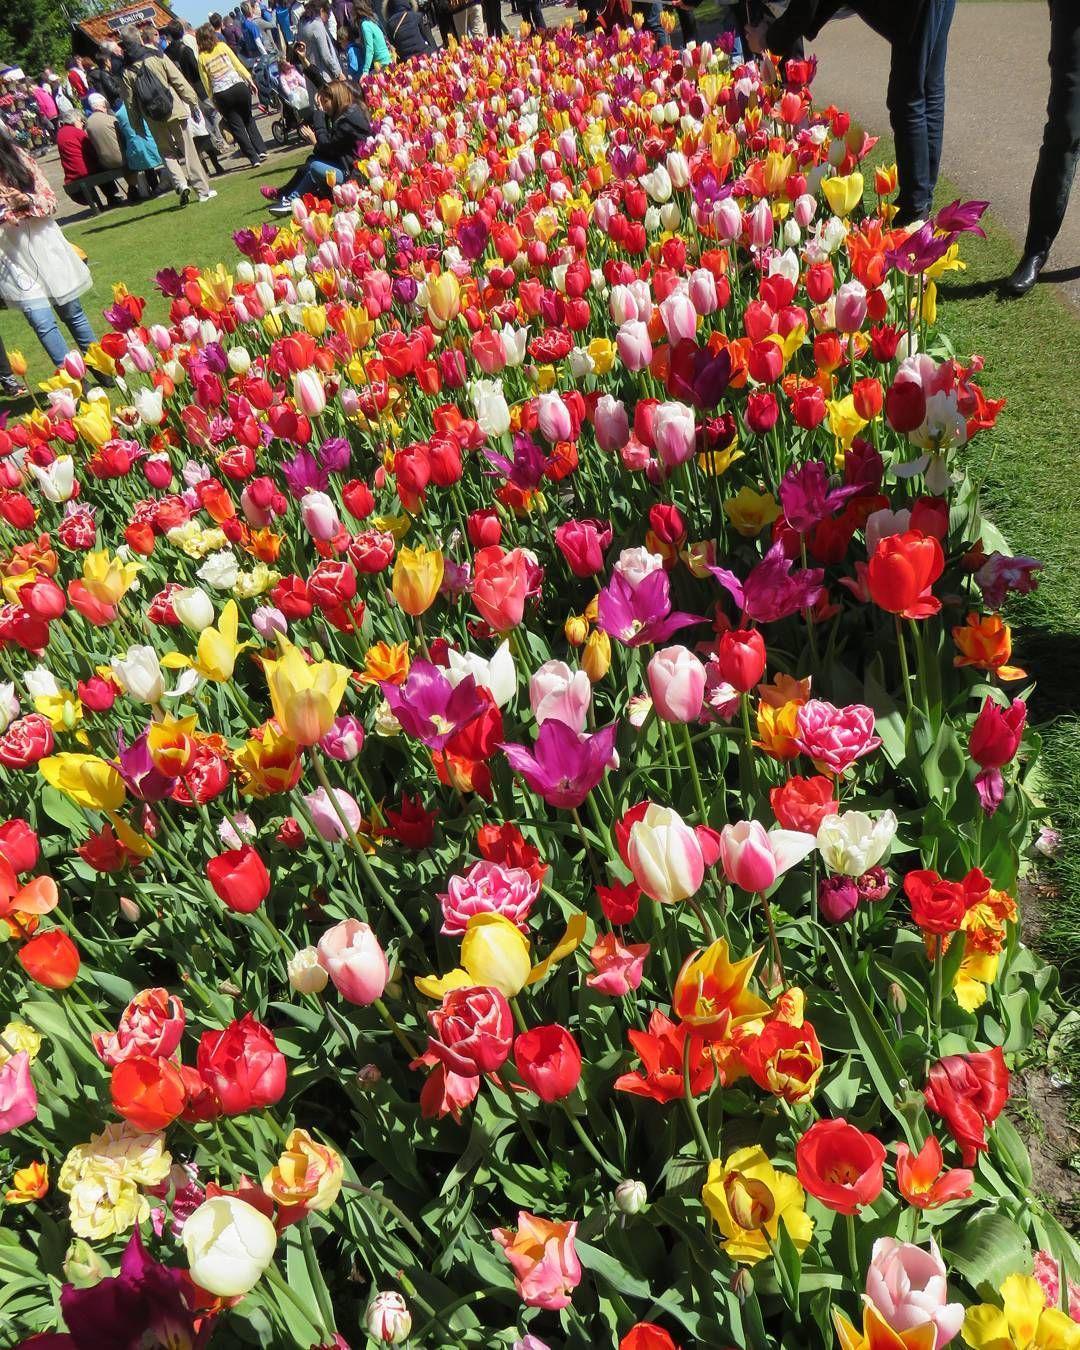 #keukenhof #holland #tulip #colorful #nikon #nikon1 #j5 #travel #digitalcamera #キューケンホフ #キューケンホフ公園 #チューリップ #チューリップ畑 #オランダ #ヨーロッパ #海外旅行 #ニコン #コンデジ #コンデジ写真部 #デジカメ #花 #花畑 #flowers #photography #photo #写真撮ってる人と繋がりたい #写真好きな人と繋がりたい #大型連休 #ゴールデンウィーク #goldenweek by vactorian